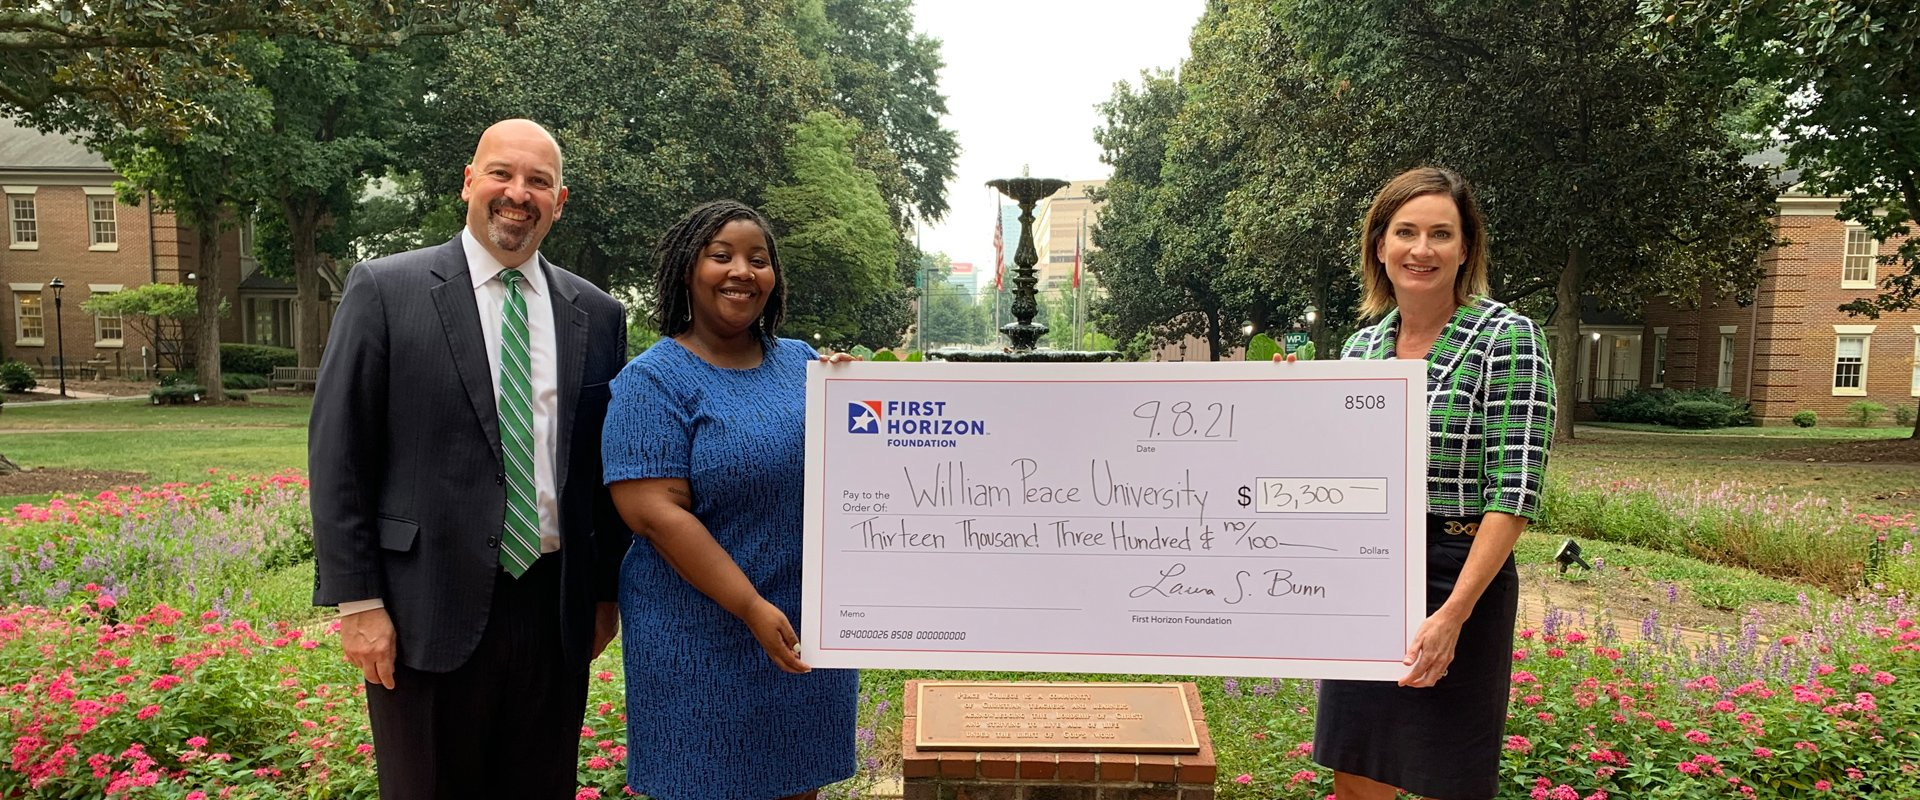 First Horizon donation to WPU for DEI (hero)